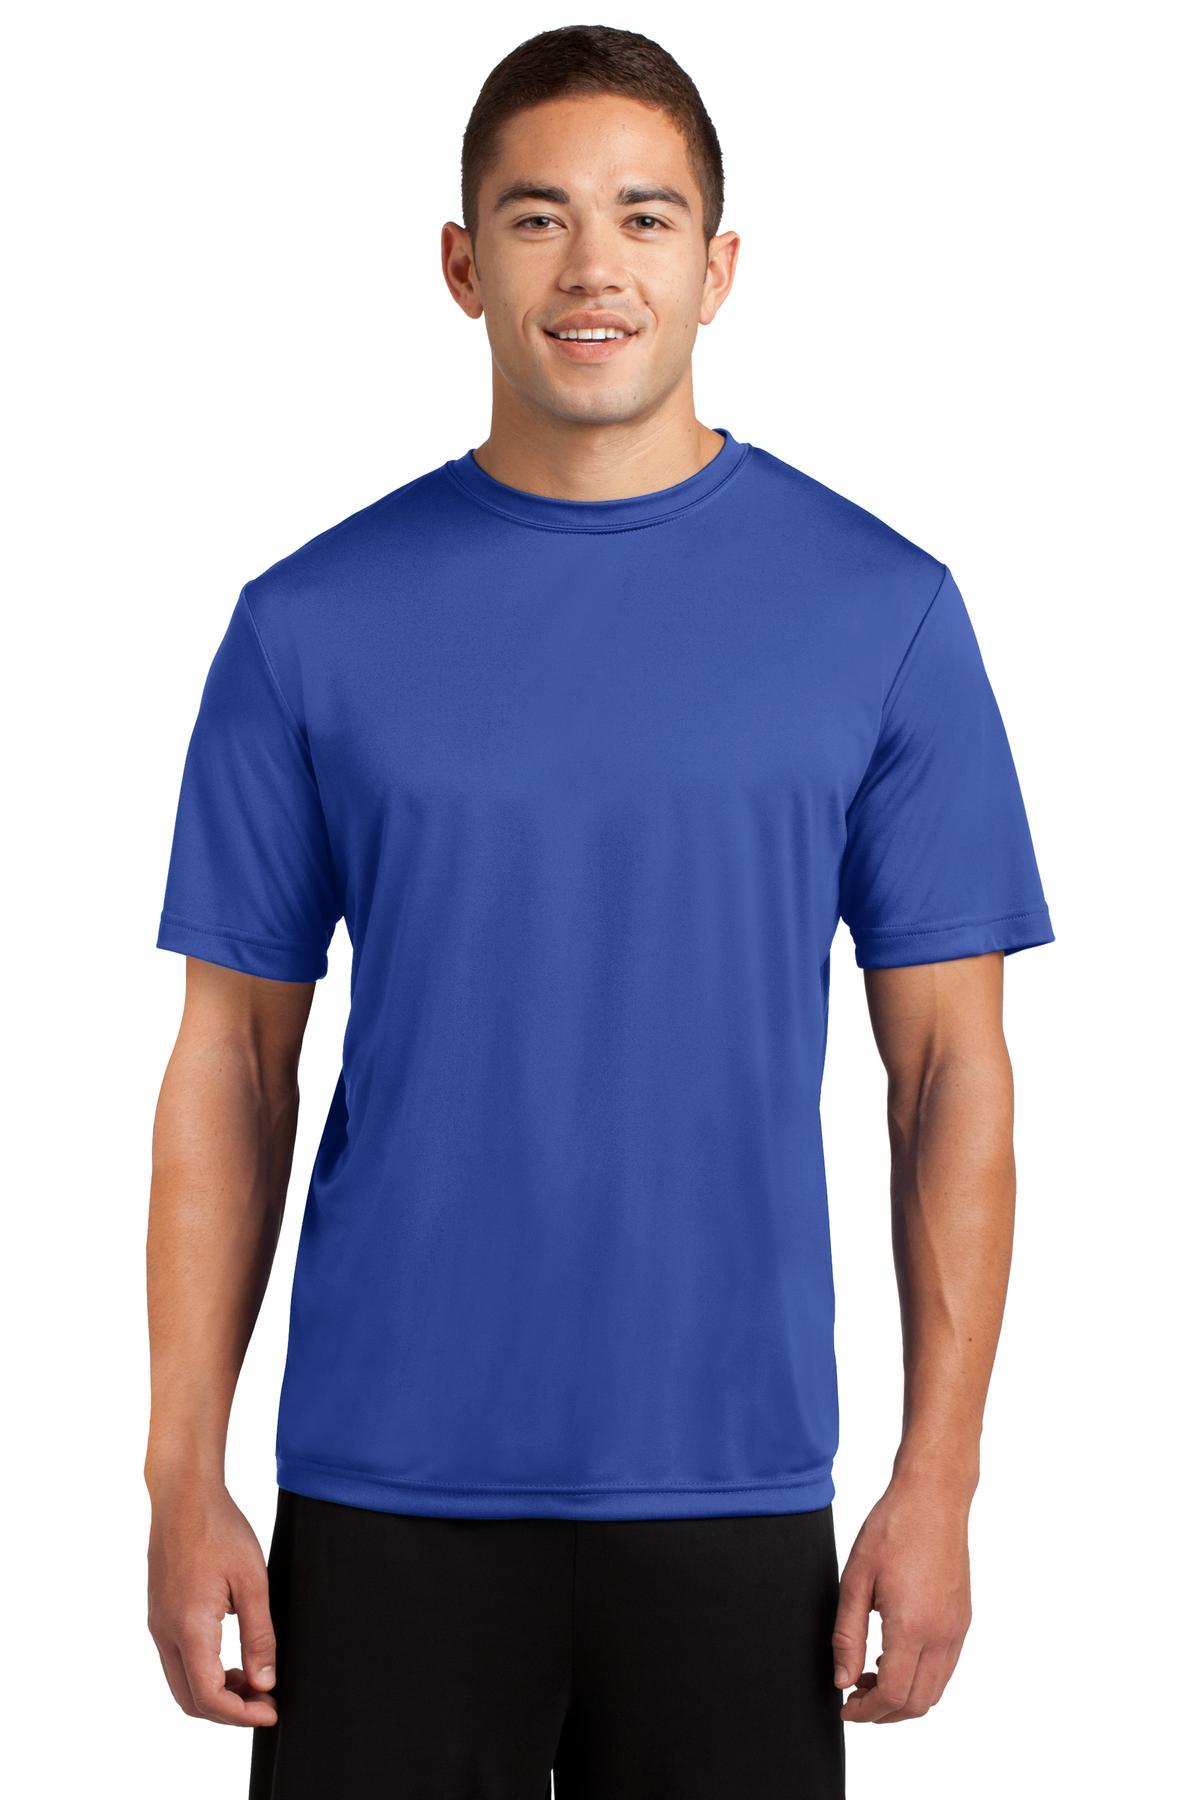 T-Shirts-Performance-25